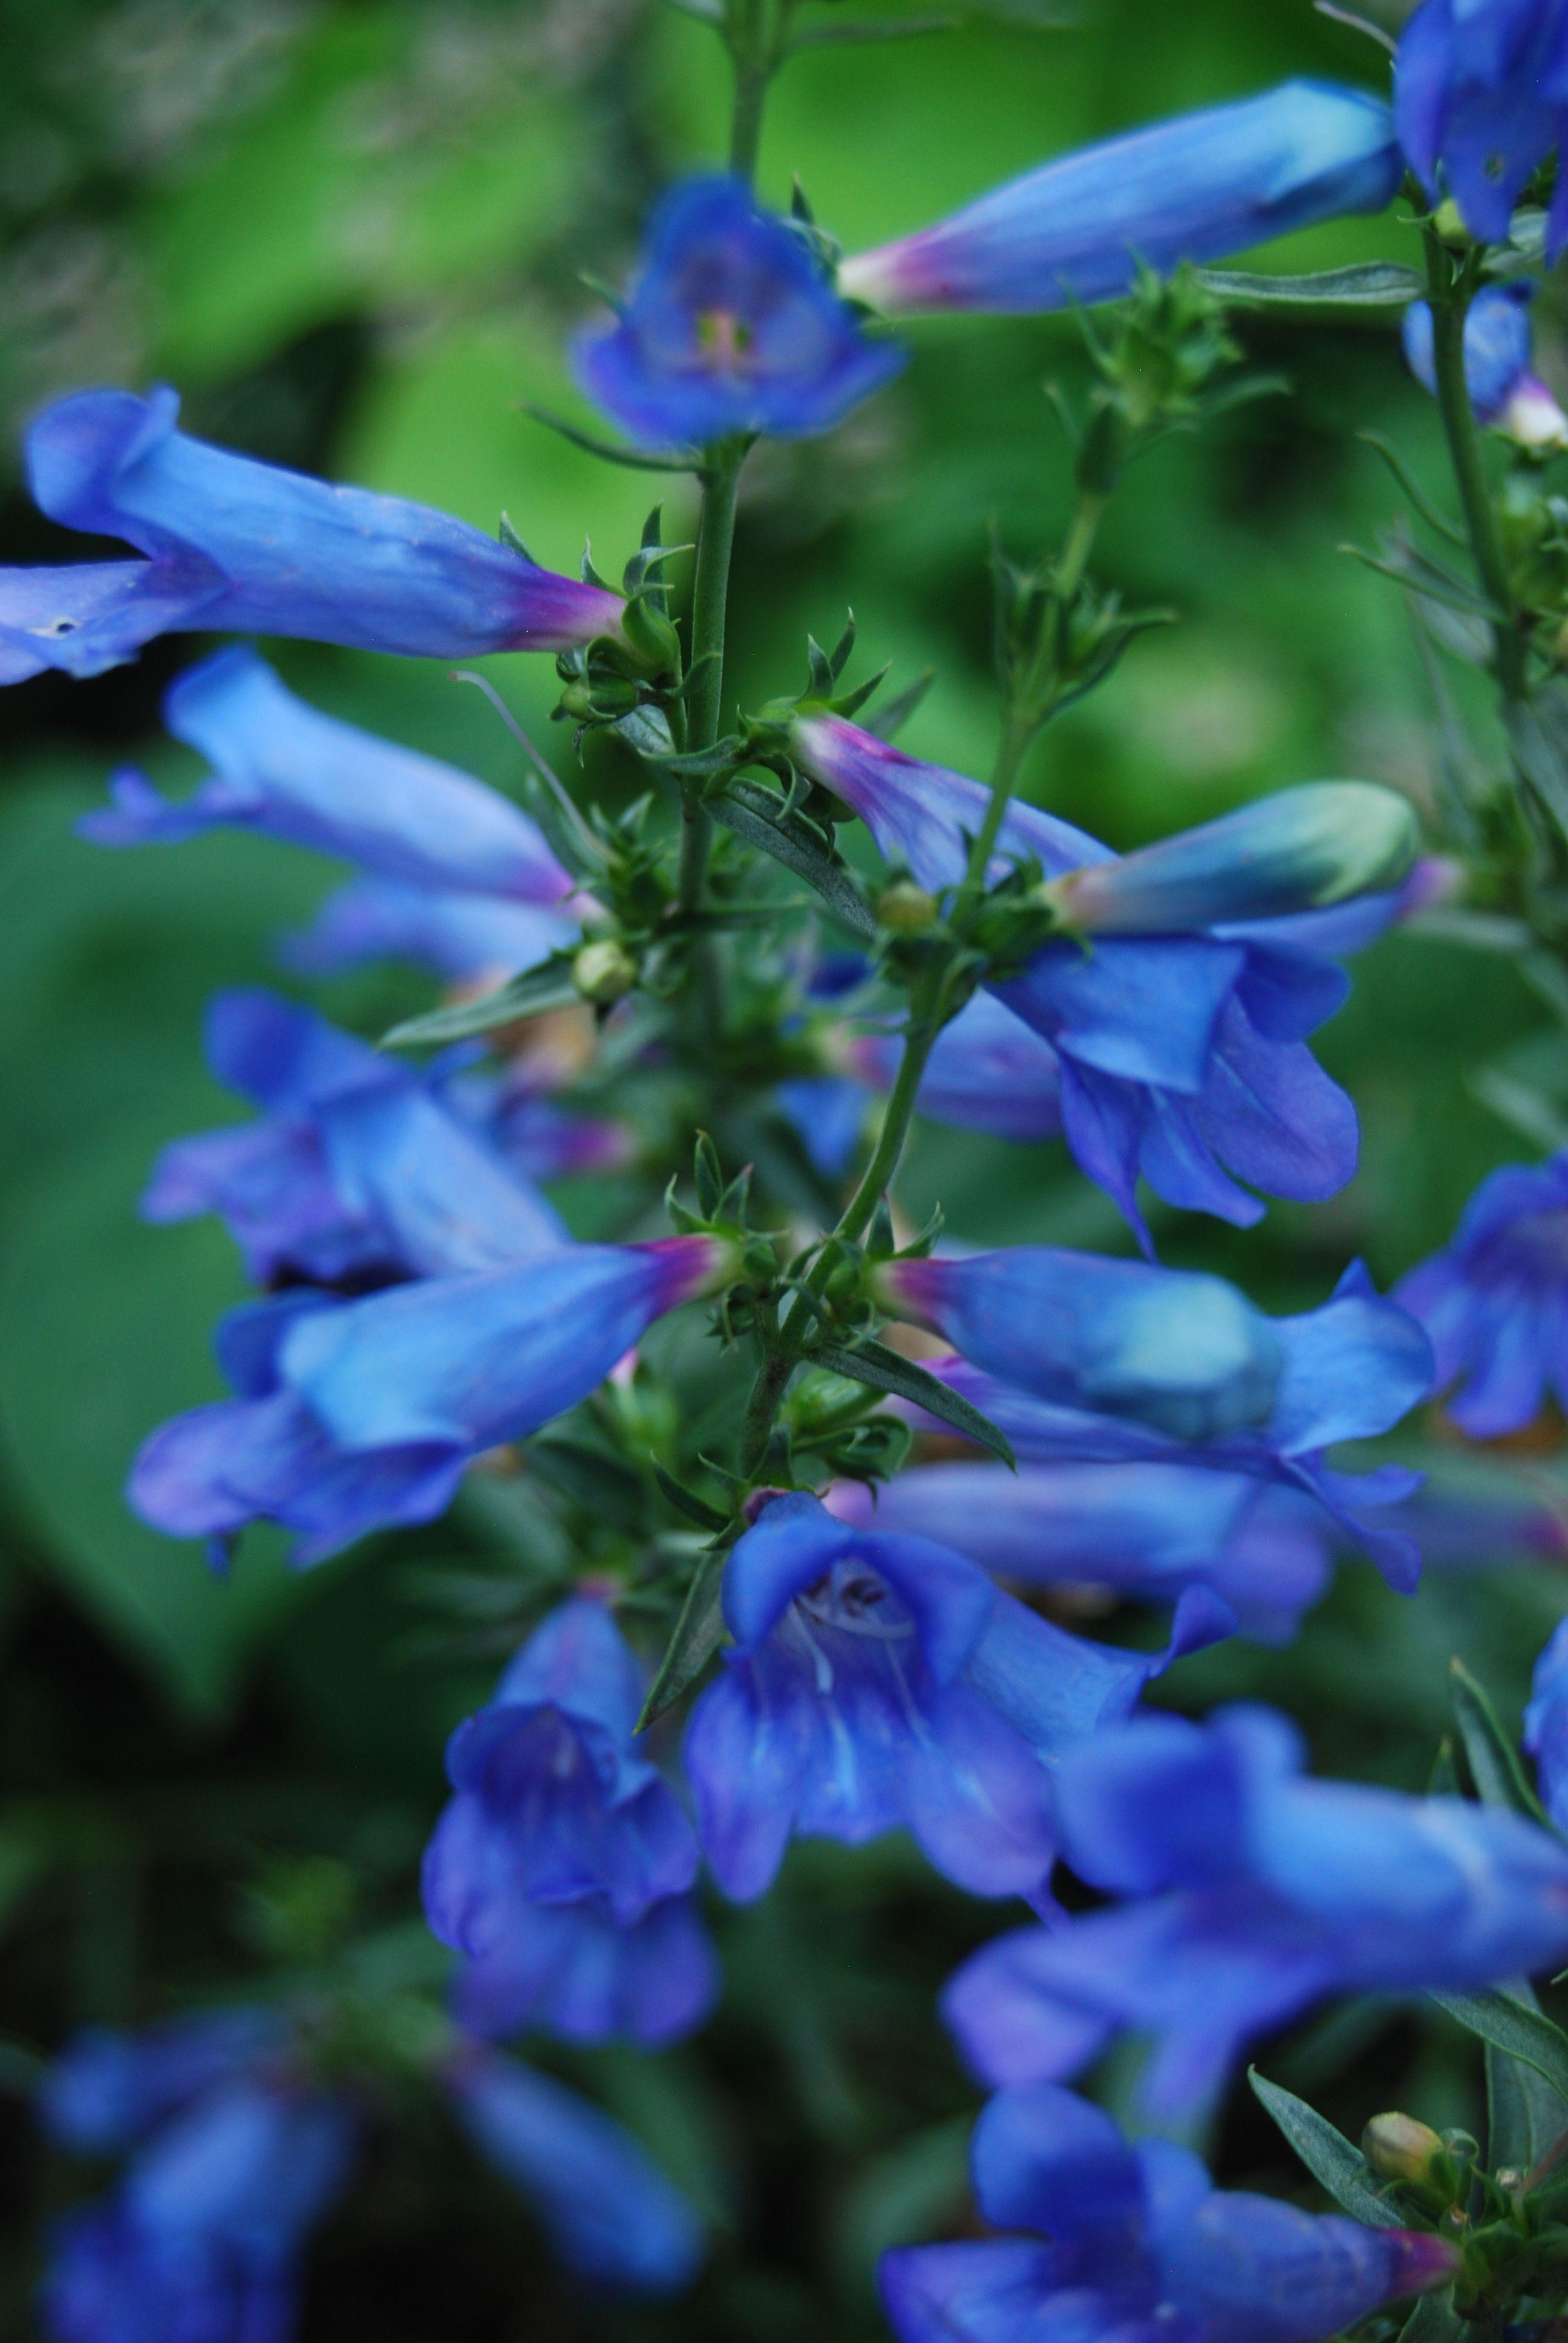 Penstemon Virgatus Blue Buckle Beardtongue Zn 3 8 Bushy Compact Form Produces Masses Of Stiffly Upright Stalks B Blue Garden Annual Plants Unusual Plants